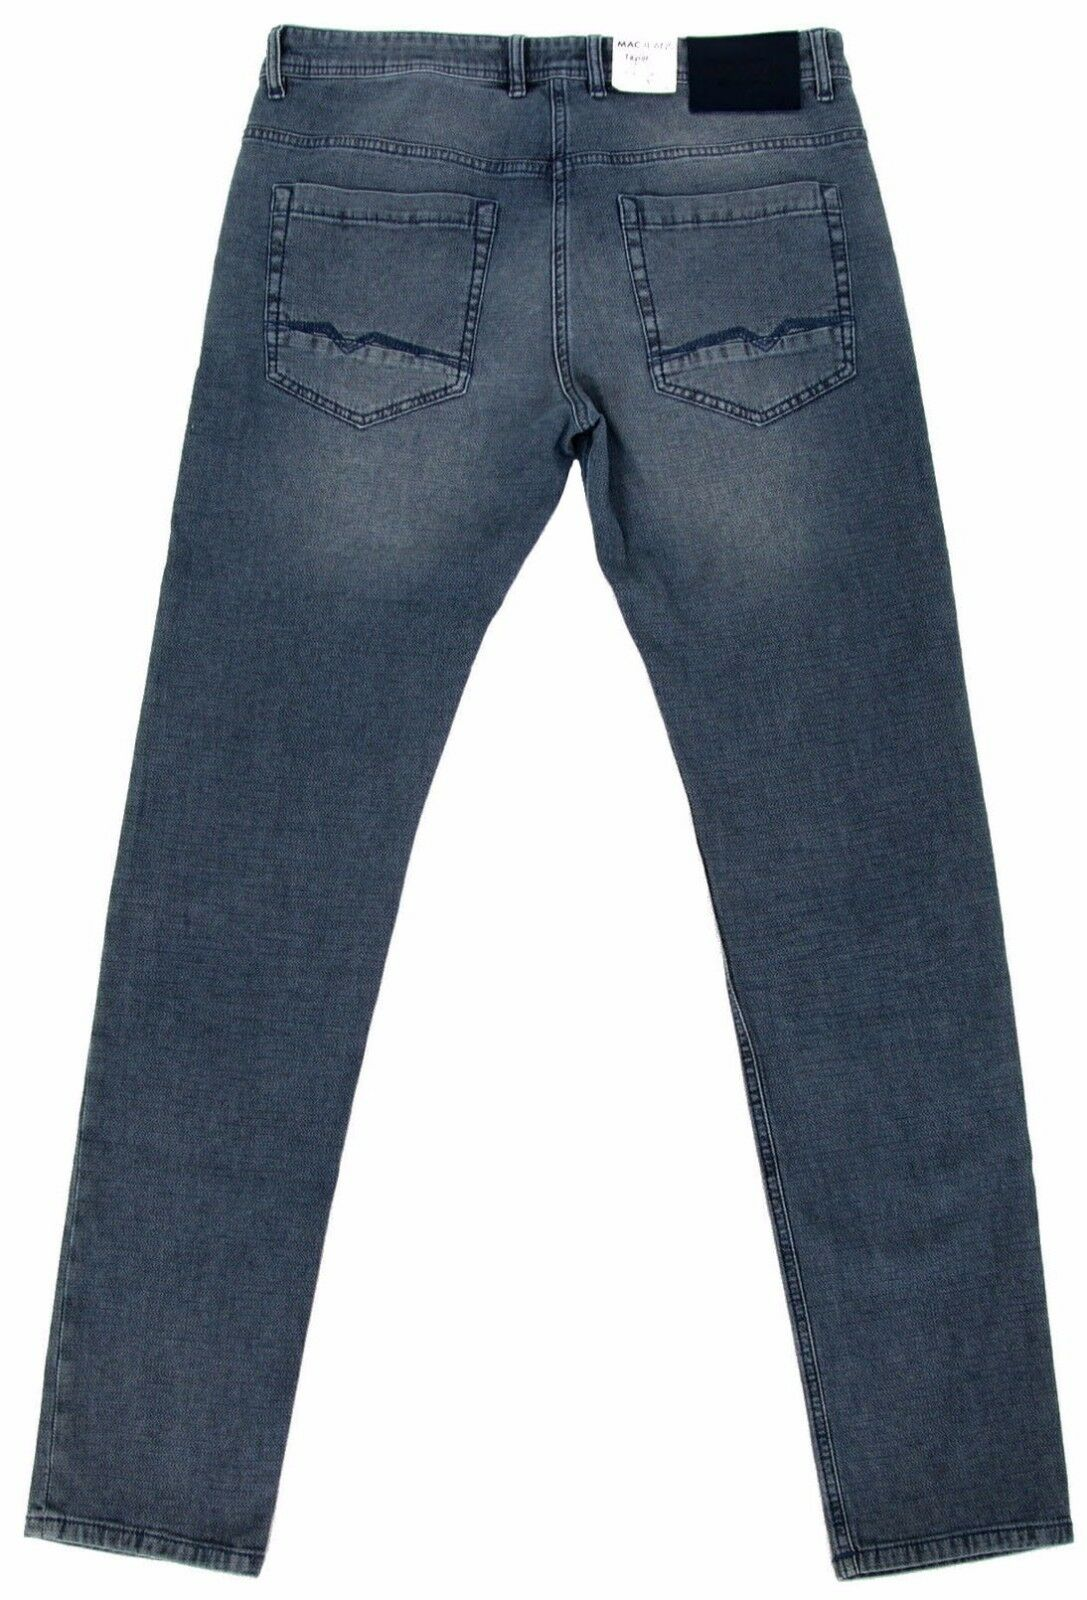 JEANS Mac Taylor Jeans Uomo Pantaloni Lang Uomo Uomo Uomo denim pants w33 l34 structured Denim 169e93